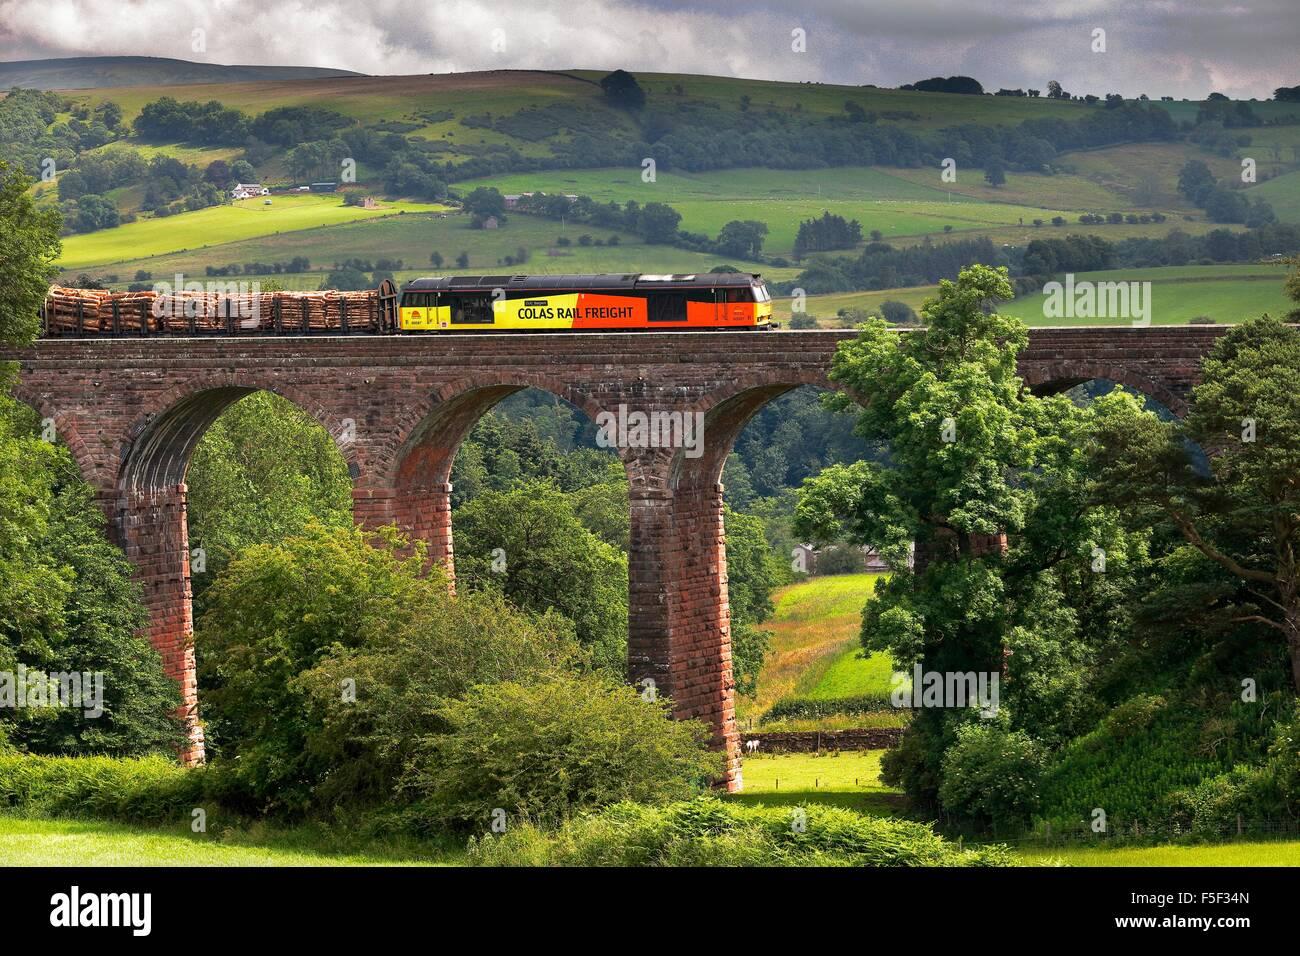 Colas Rail Freight train on Dry Beck Viaduct, Armathwaite, Eden Valley, Cumbria, England, UK. - Stock Image